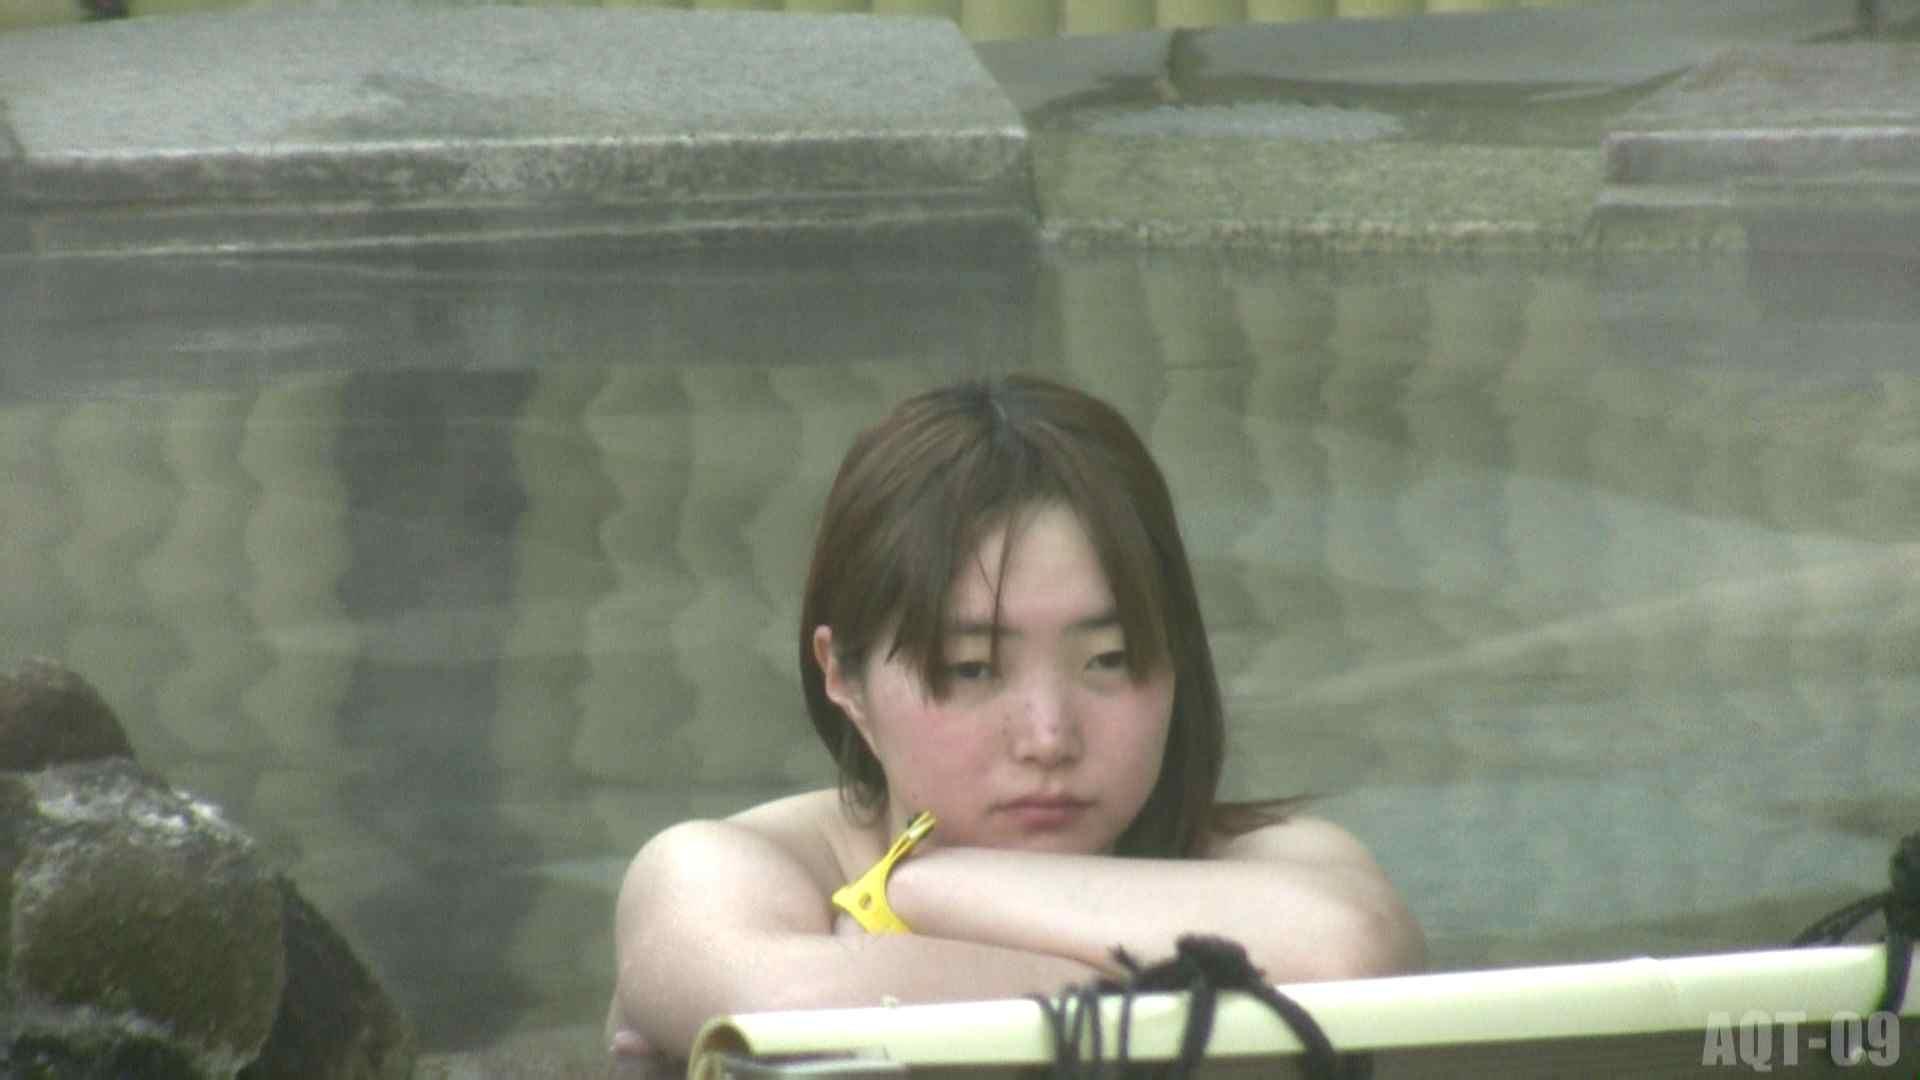 Aquaな露天風呂Vol.781 盗撮大放出 戯れ無修正画像 48連発 33